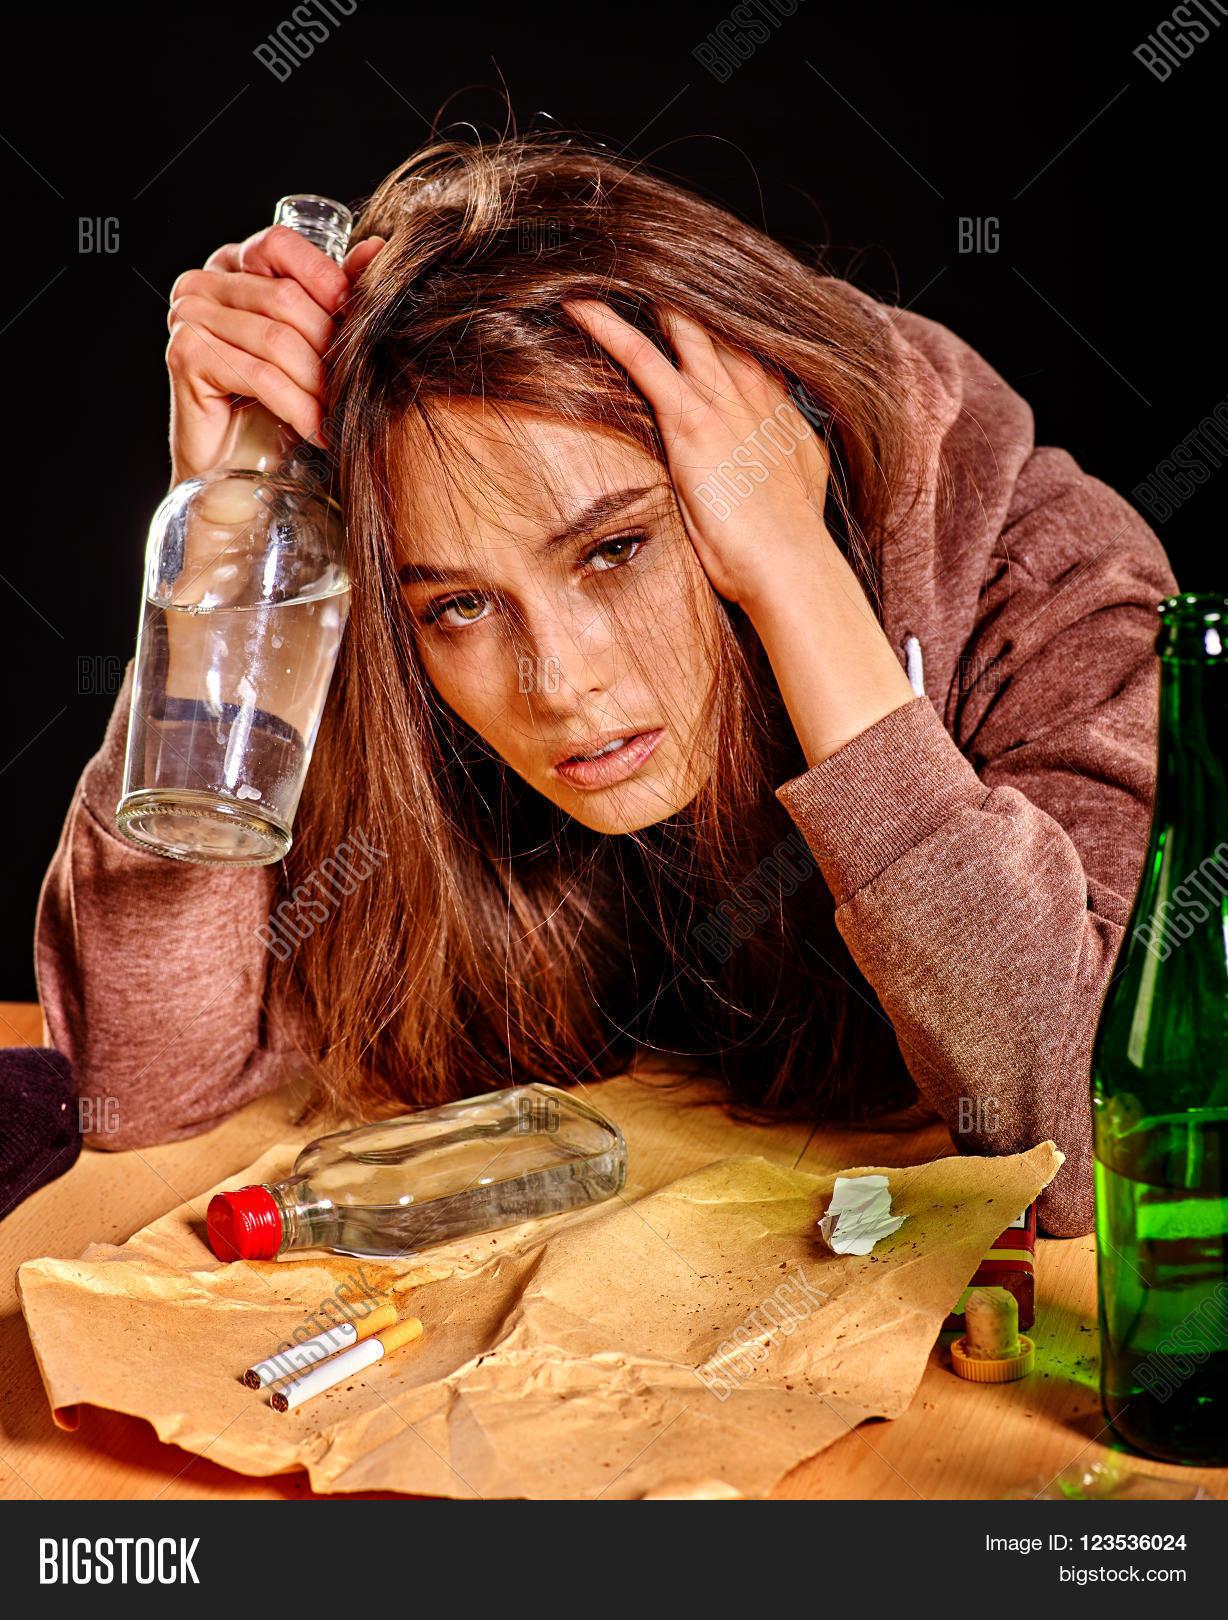 Пьянство девушек фото